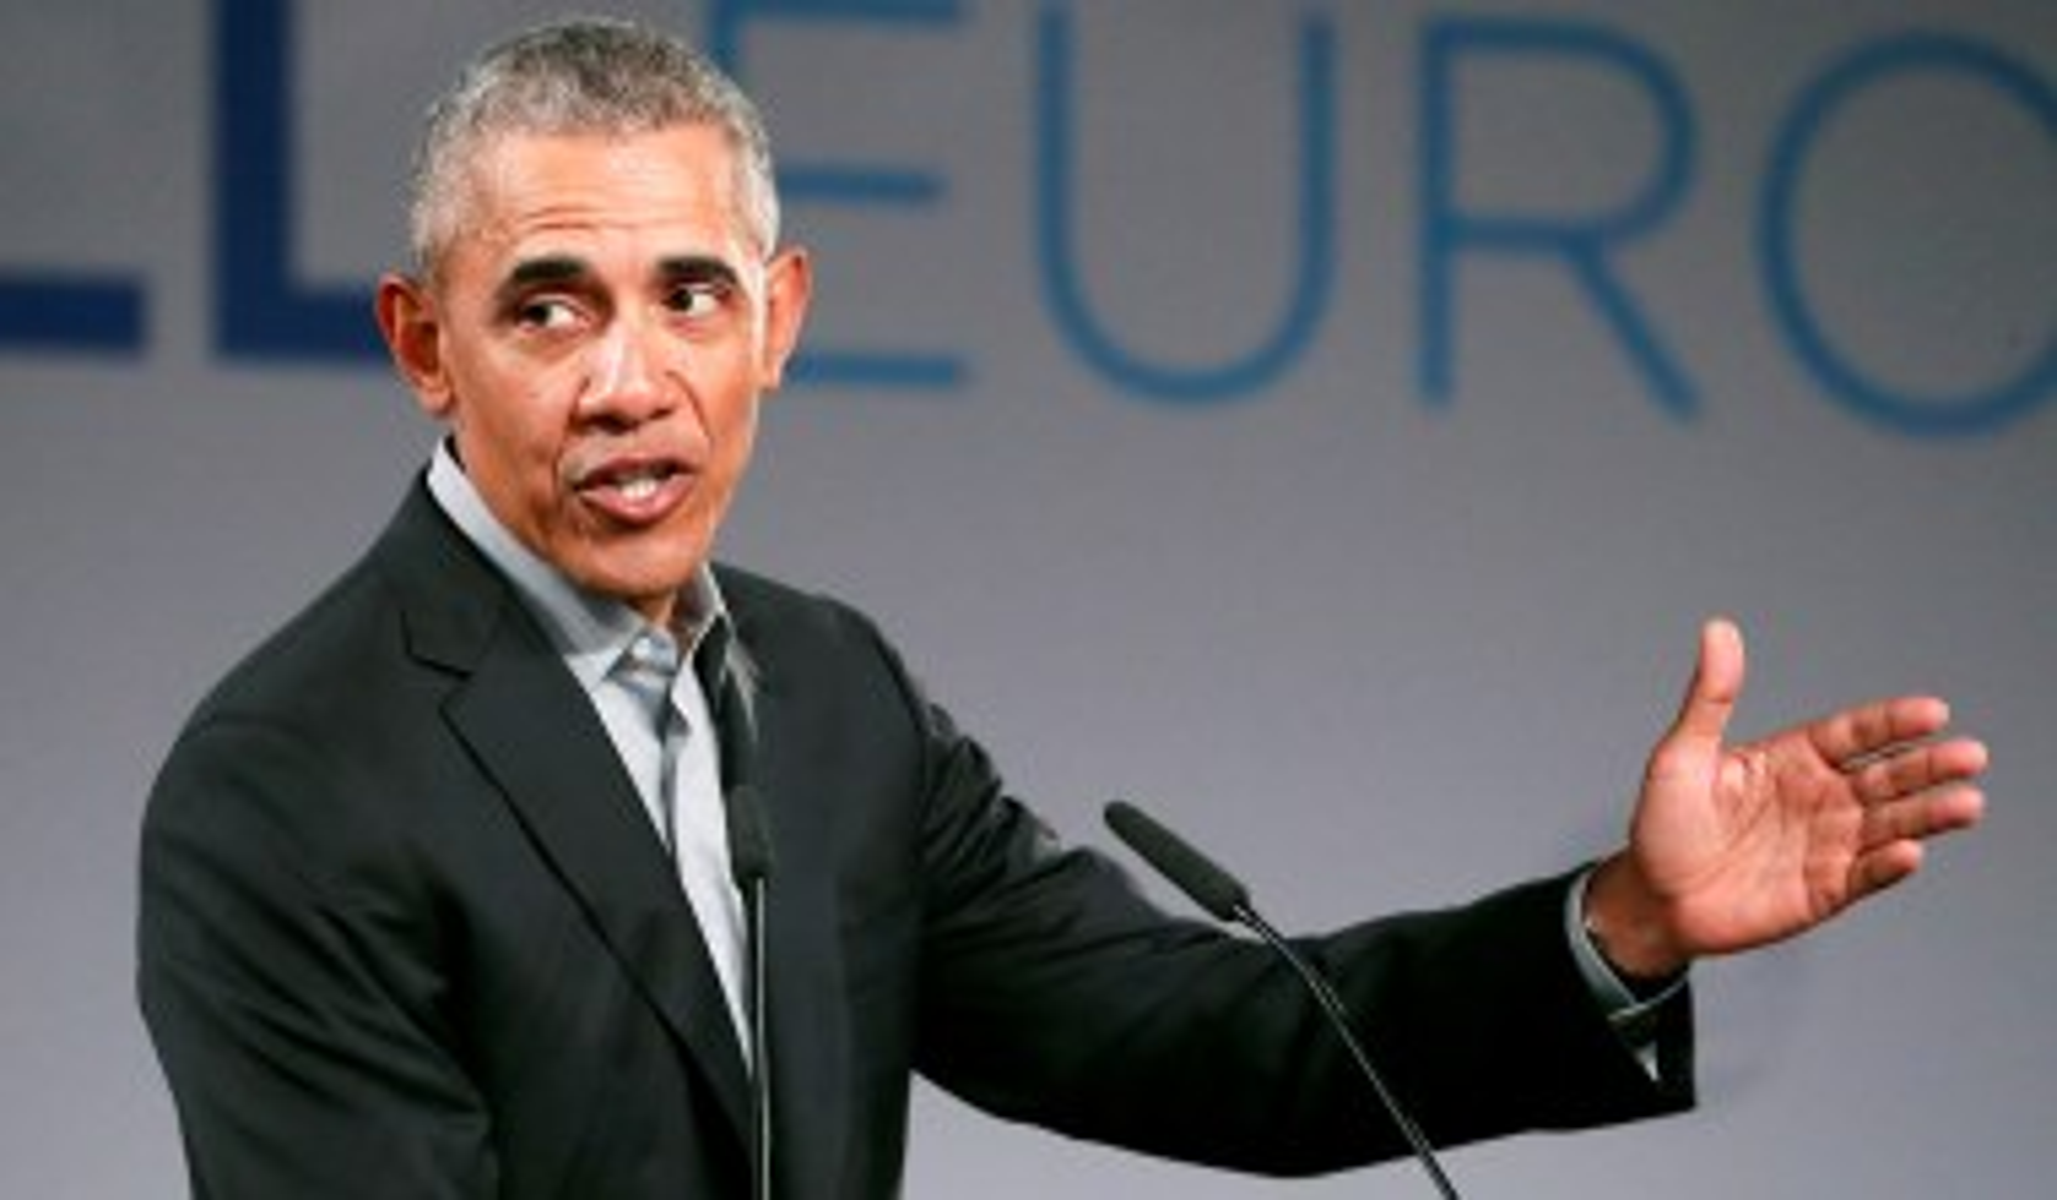 Barack Obama's Tower of Power